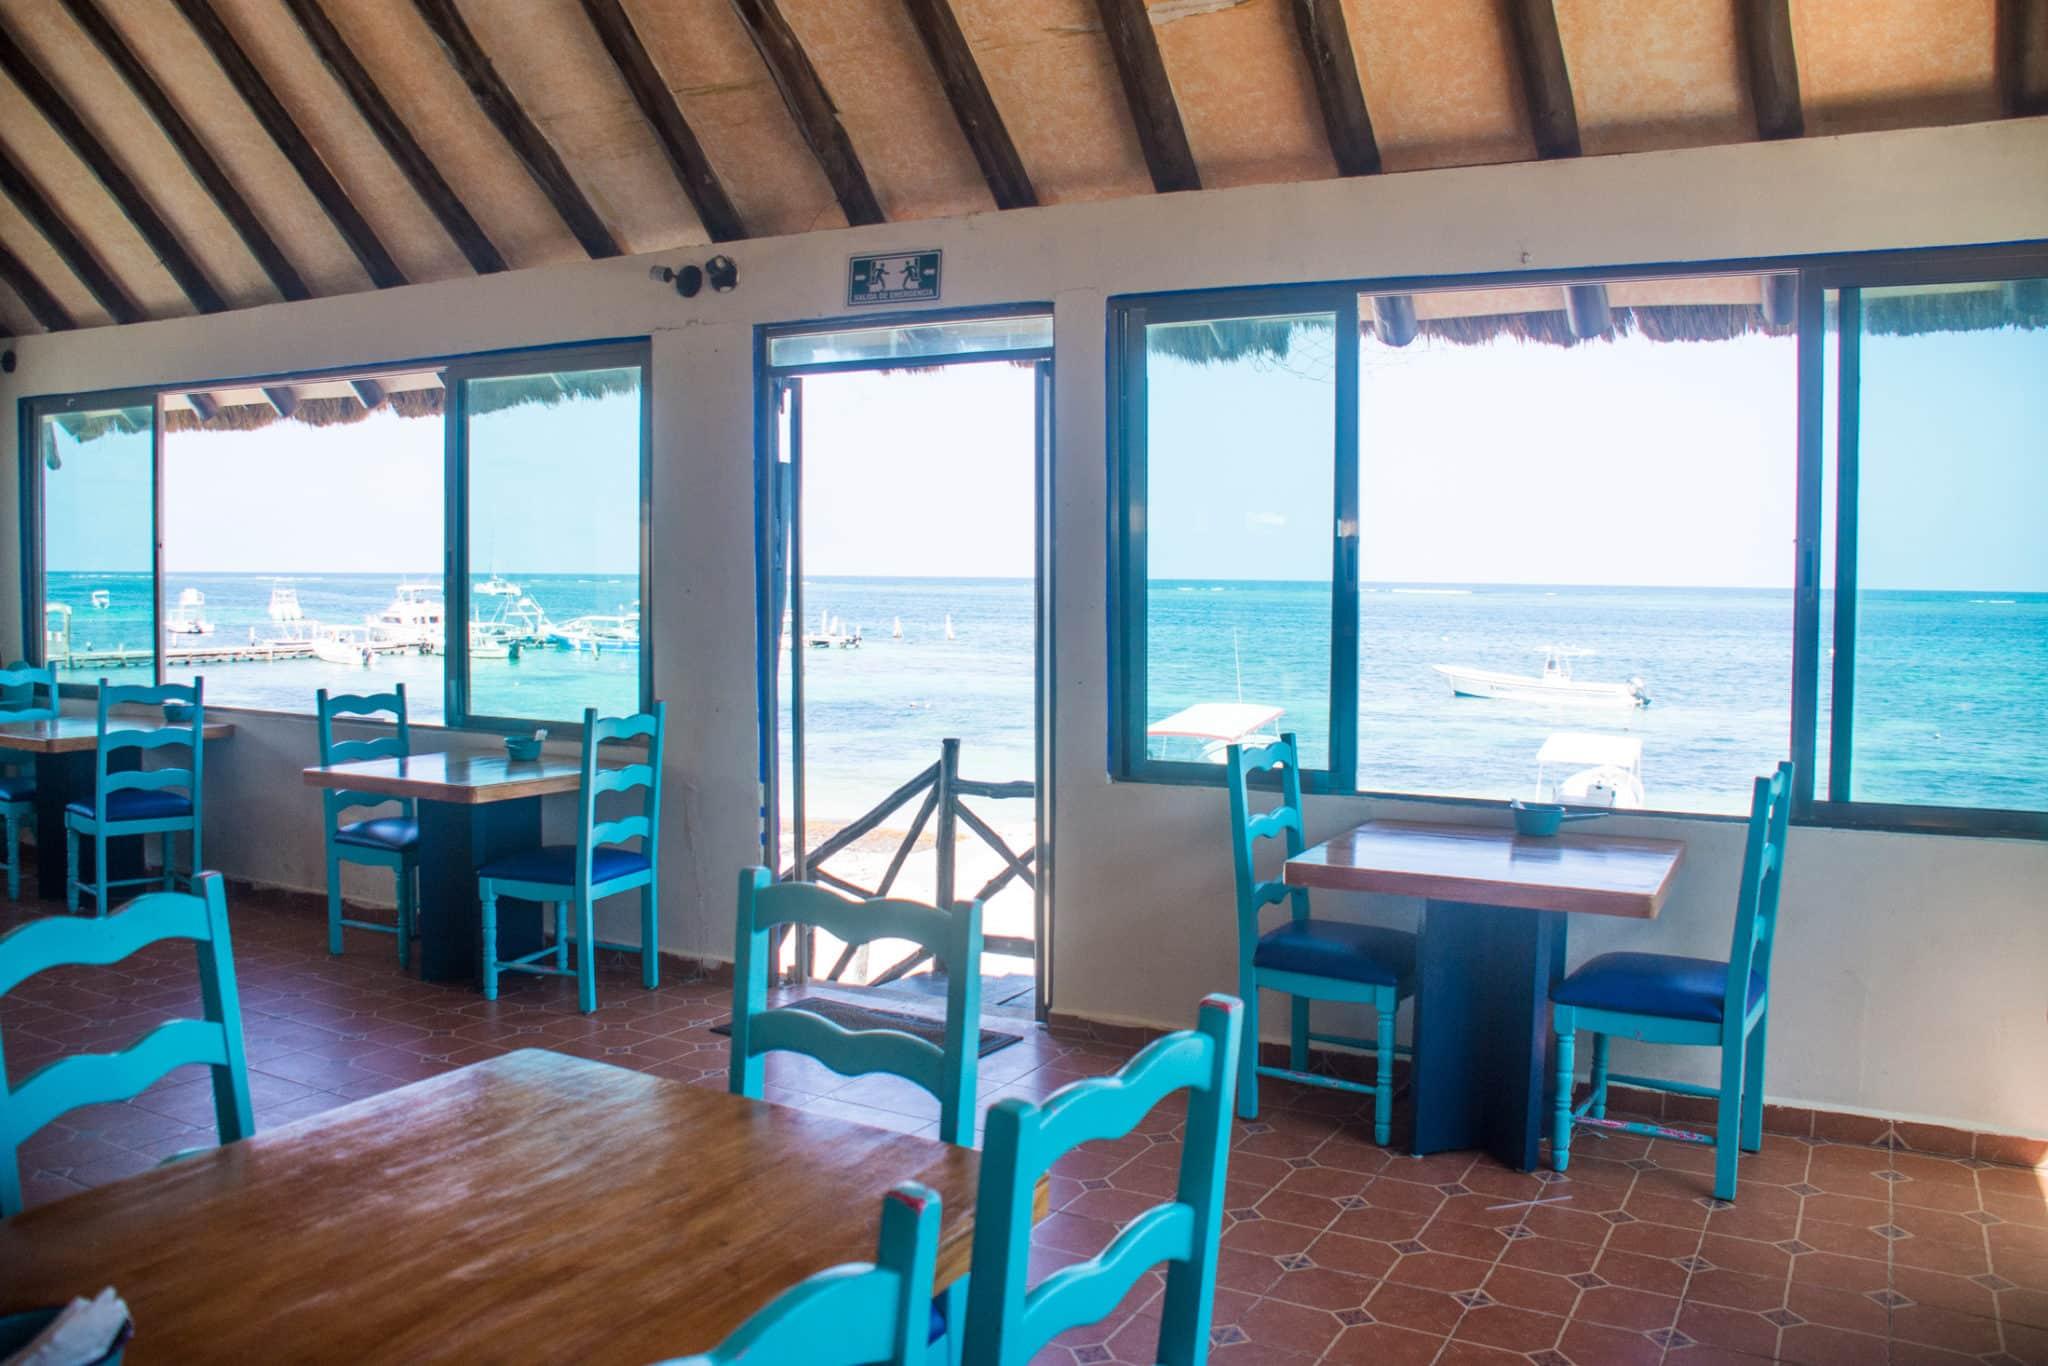 Restaurante-mesas-azules